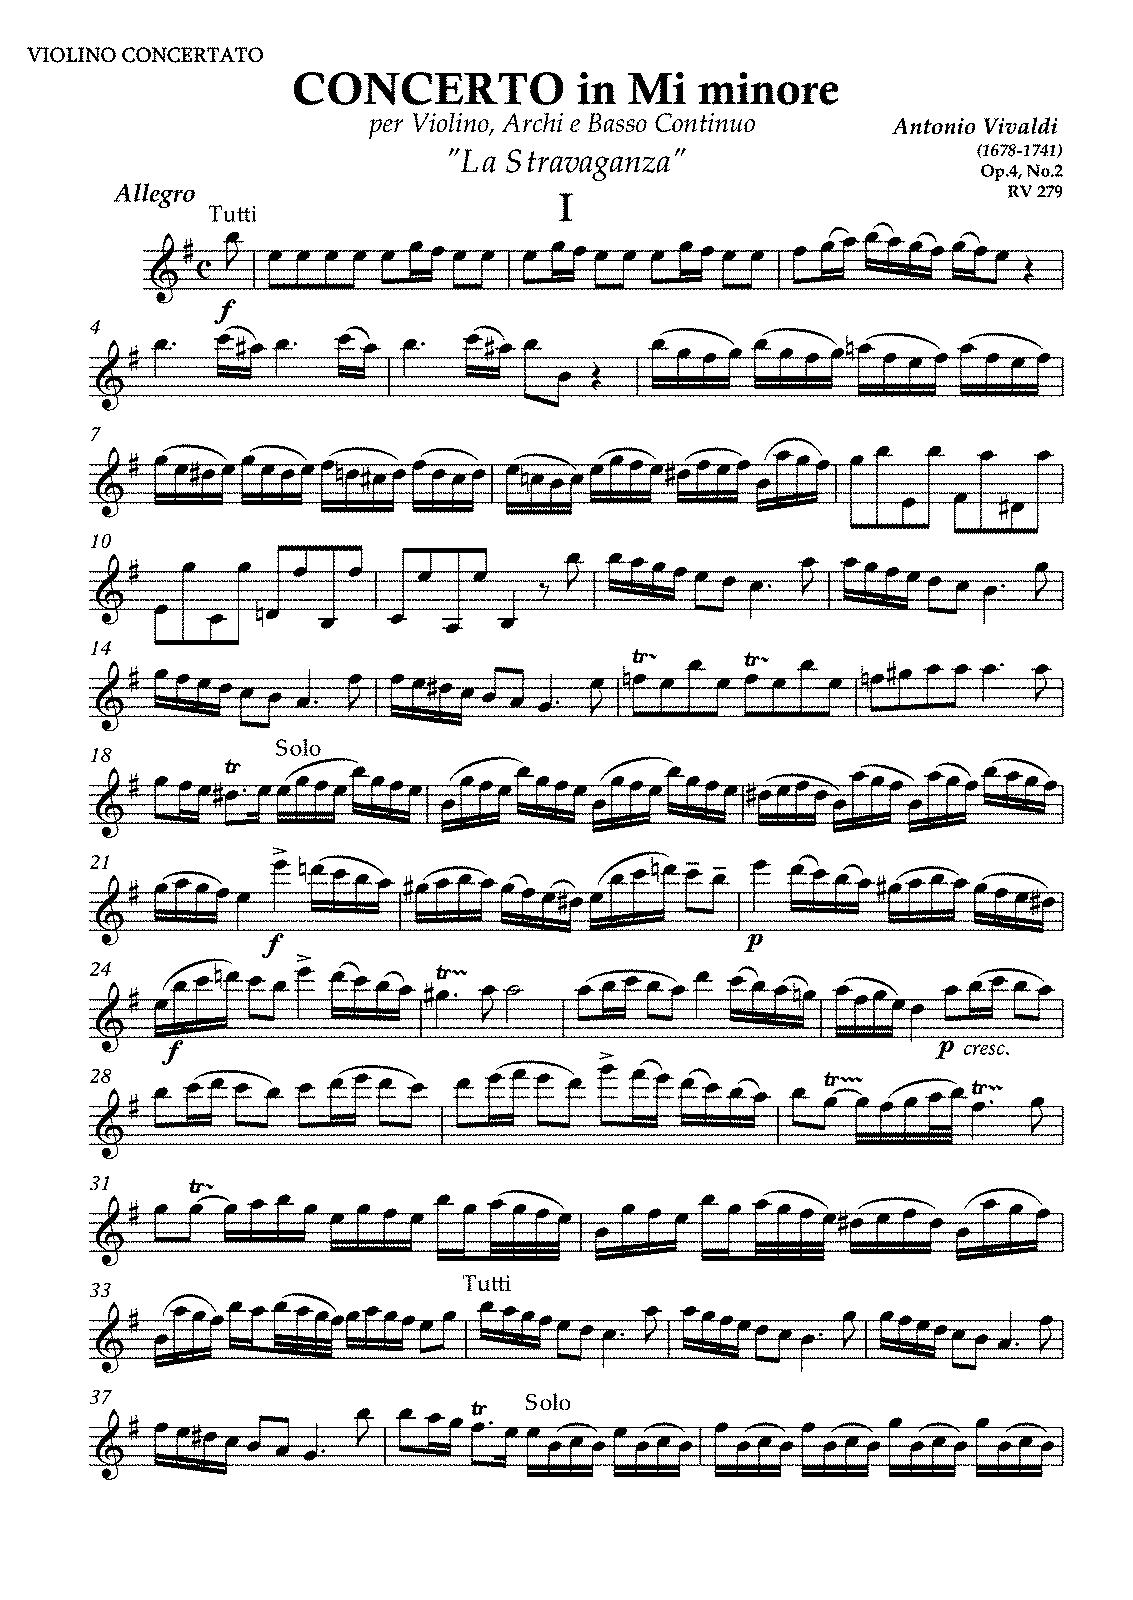 analysis of vivaldi violin concerto in Music - a complete analysis of the violin concerto no 1 in g minor, opus 26.